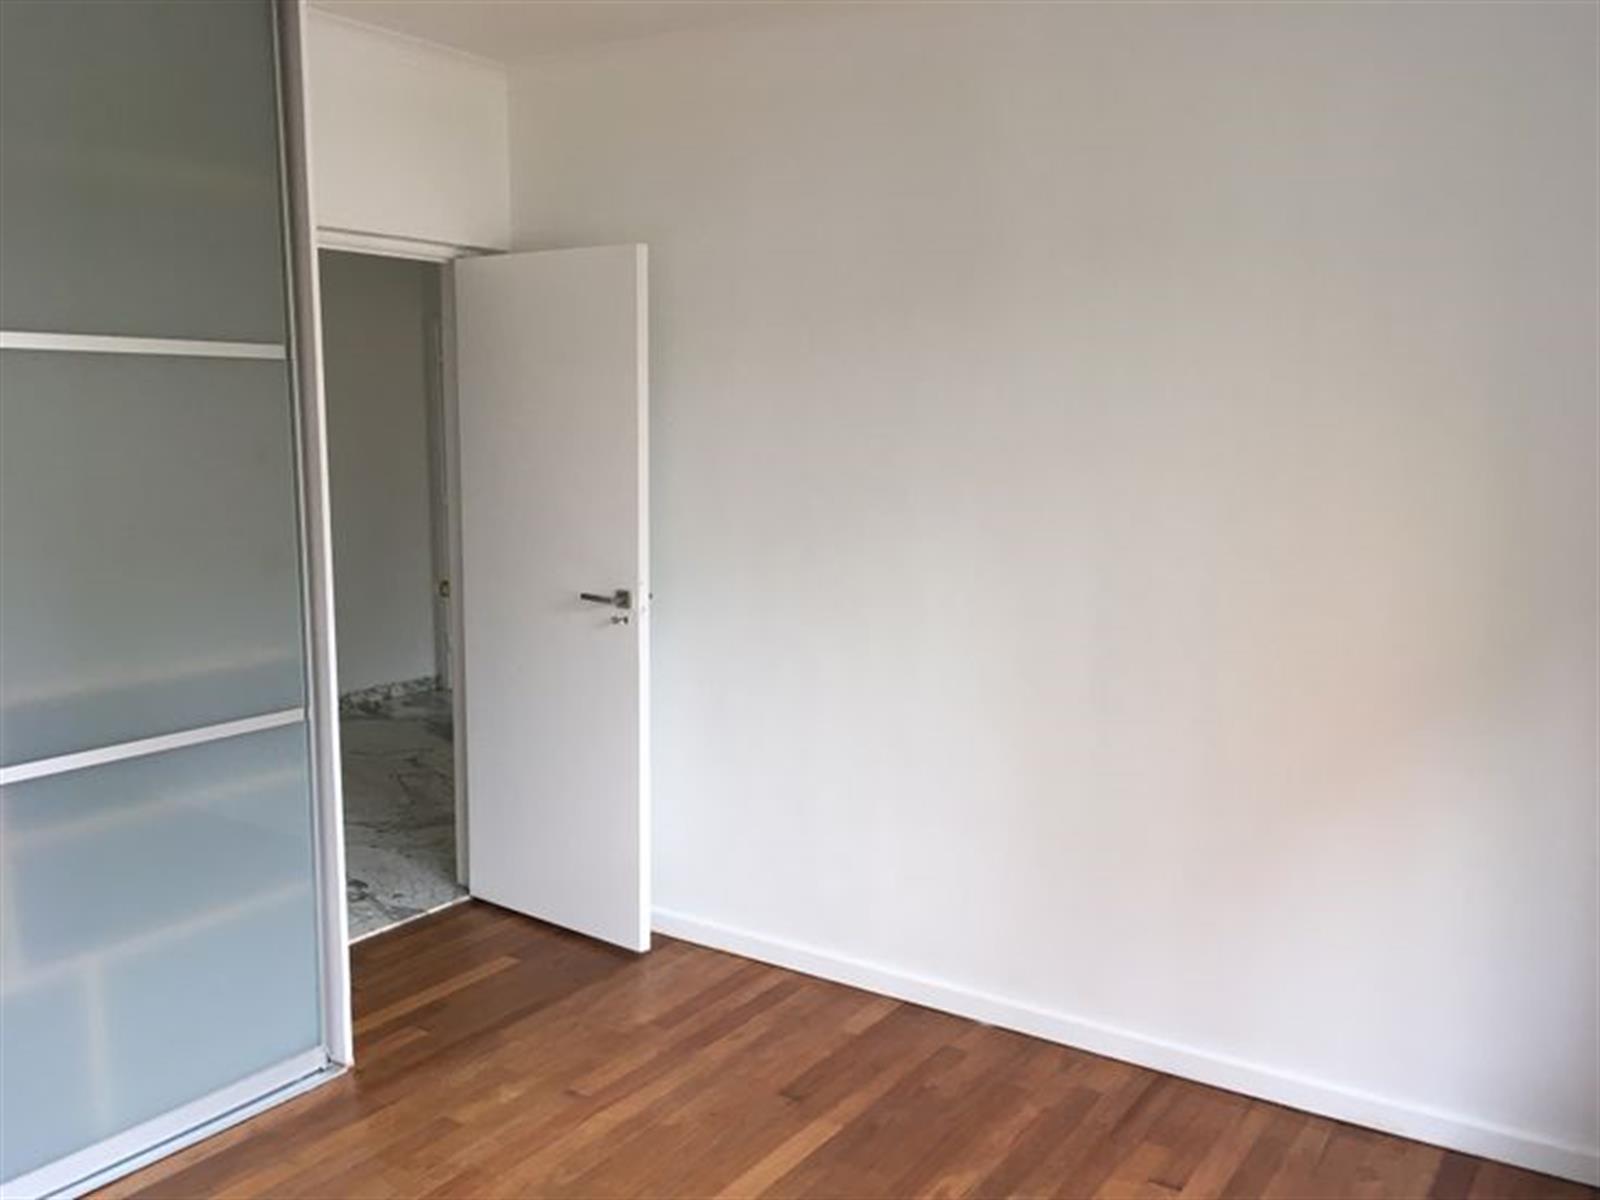 Appartement - Woluwe-Saint-Lambert - #4403252-15